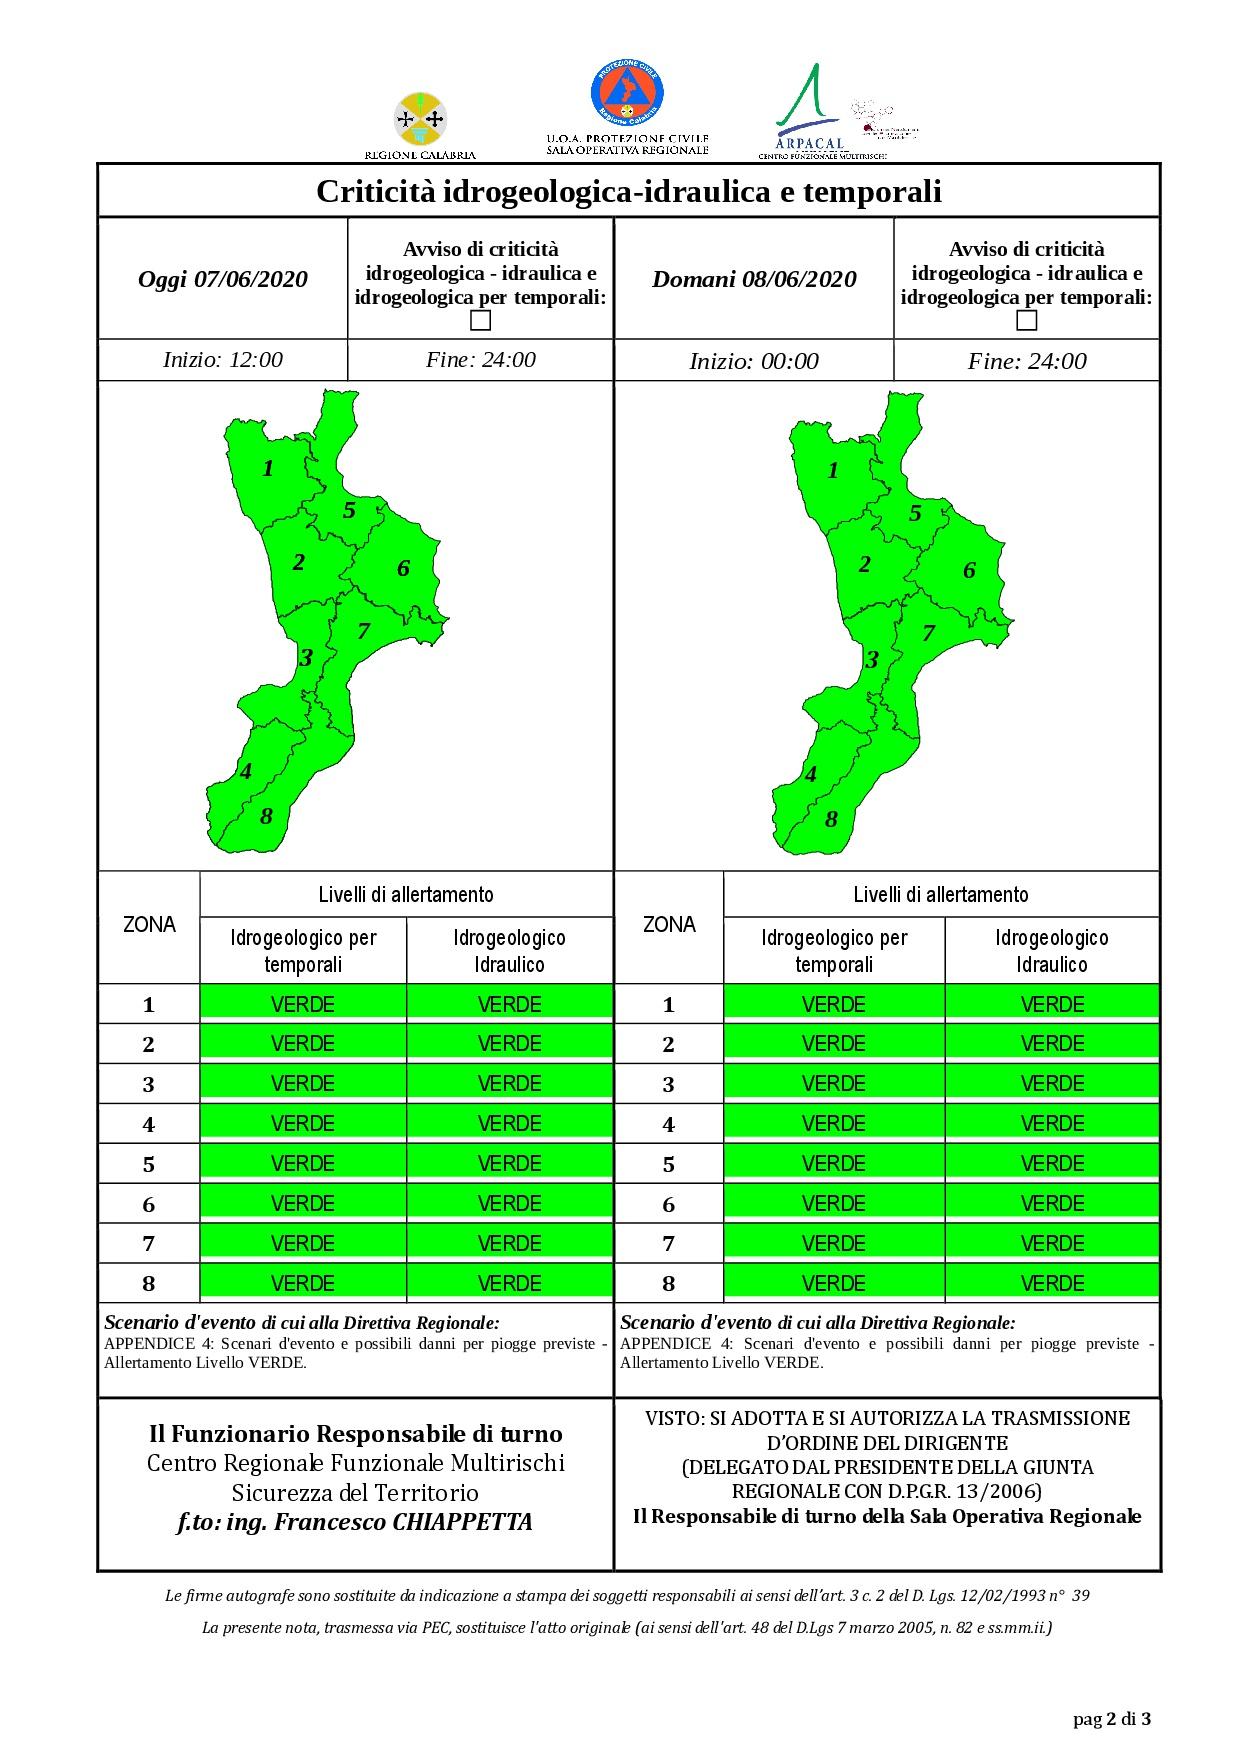 Criticità idrogeologica-idraulica e temporali in Calabria 07-06-2020